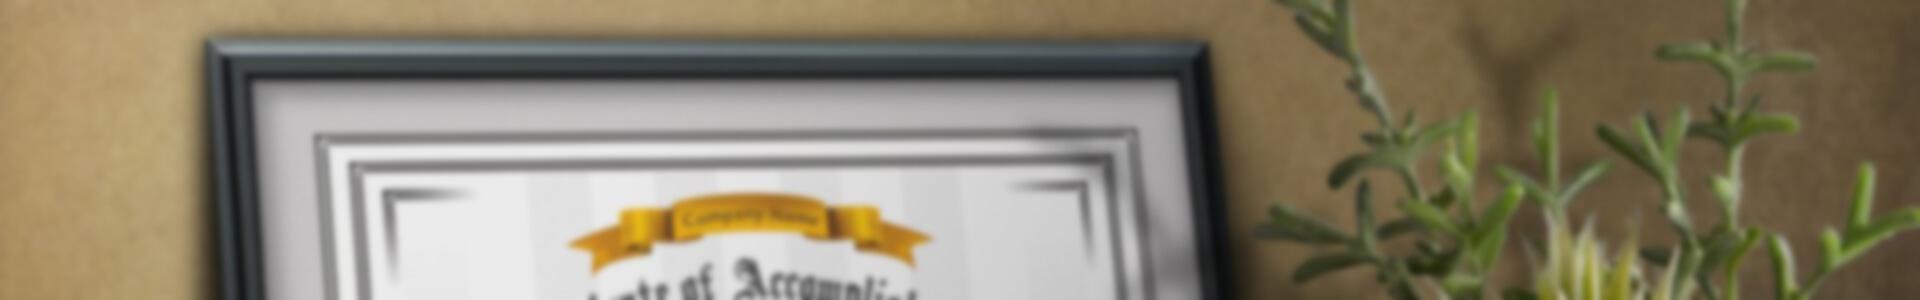 certificate  - In chứng nhận, giấy khen